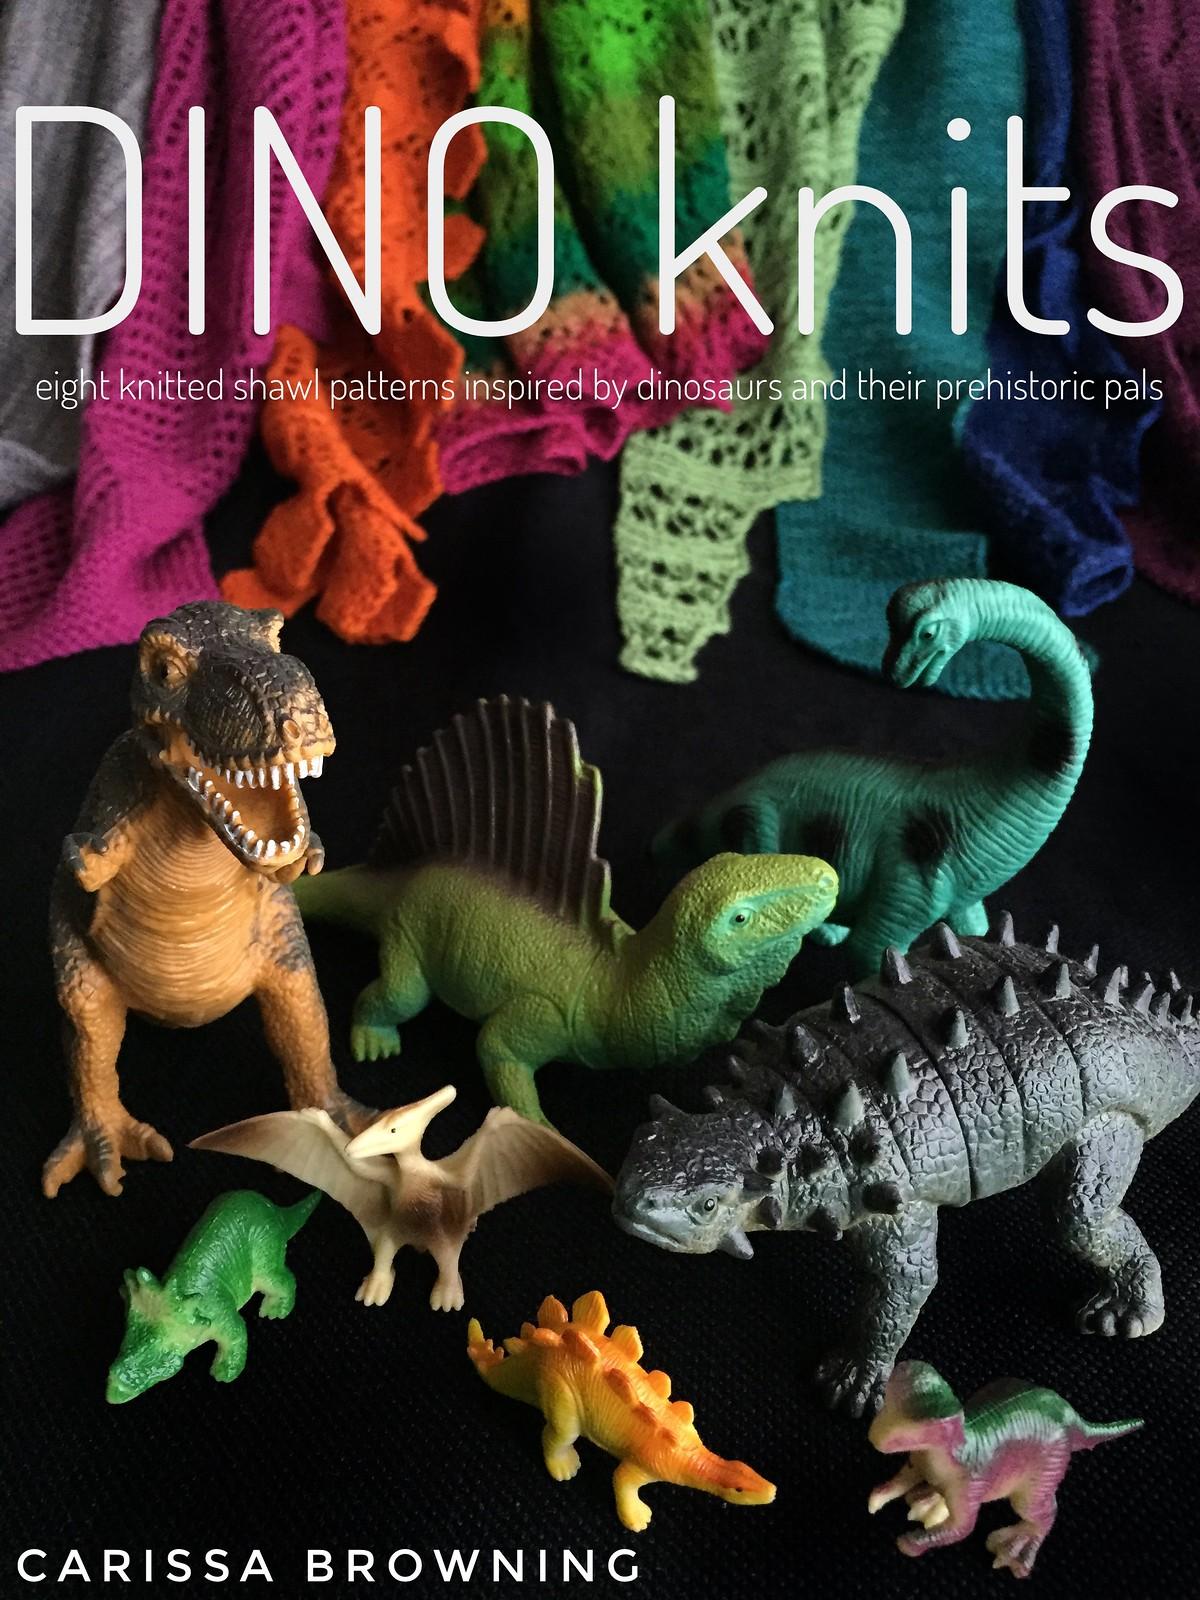 DINO knits